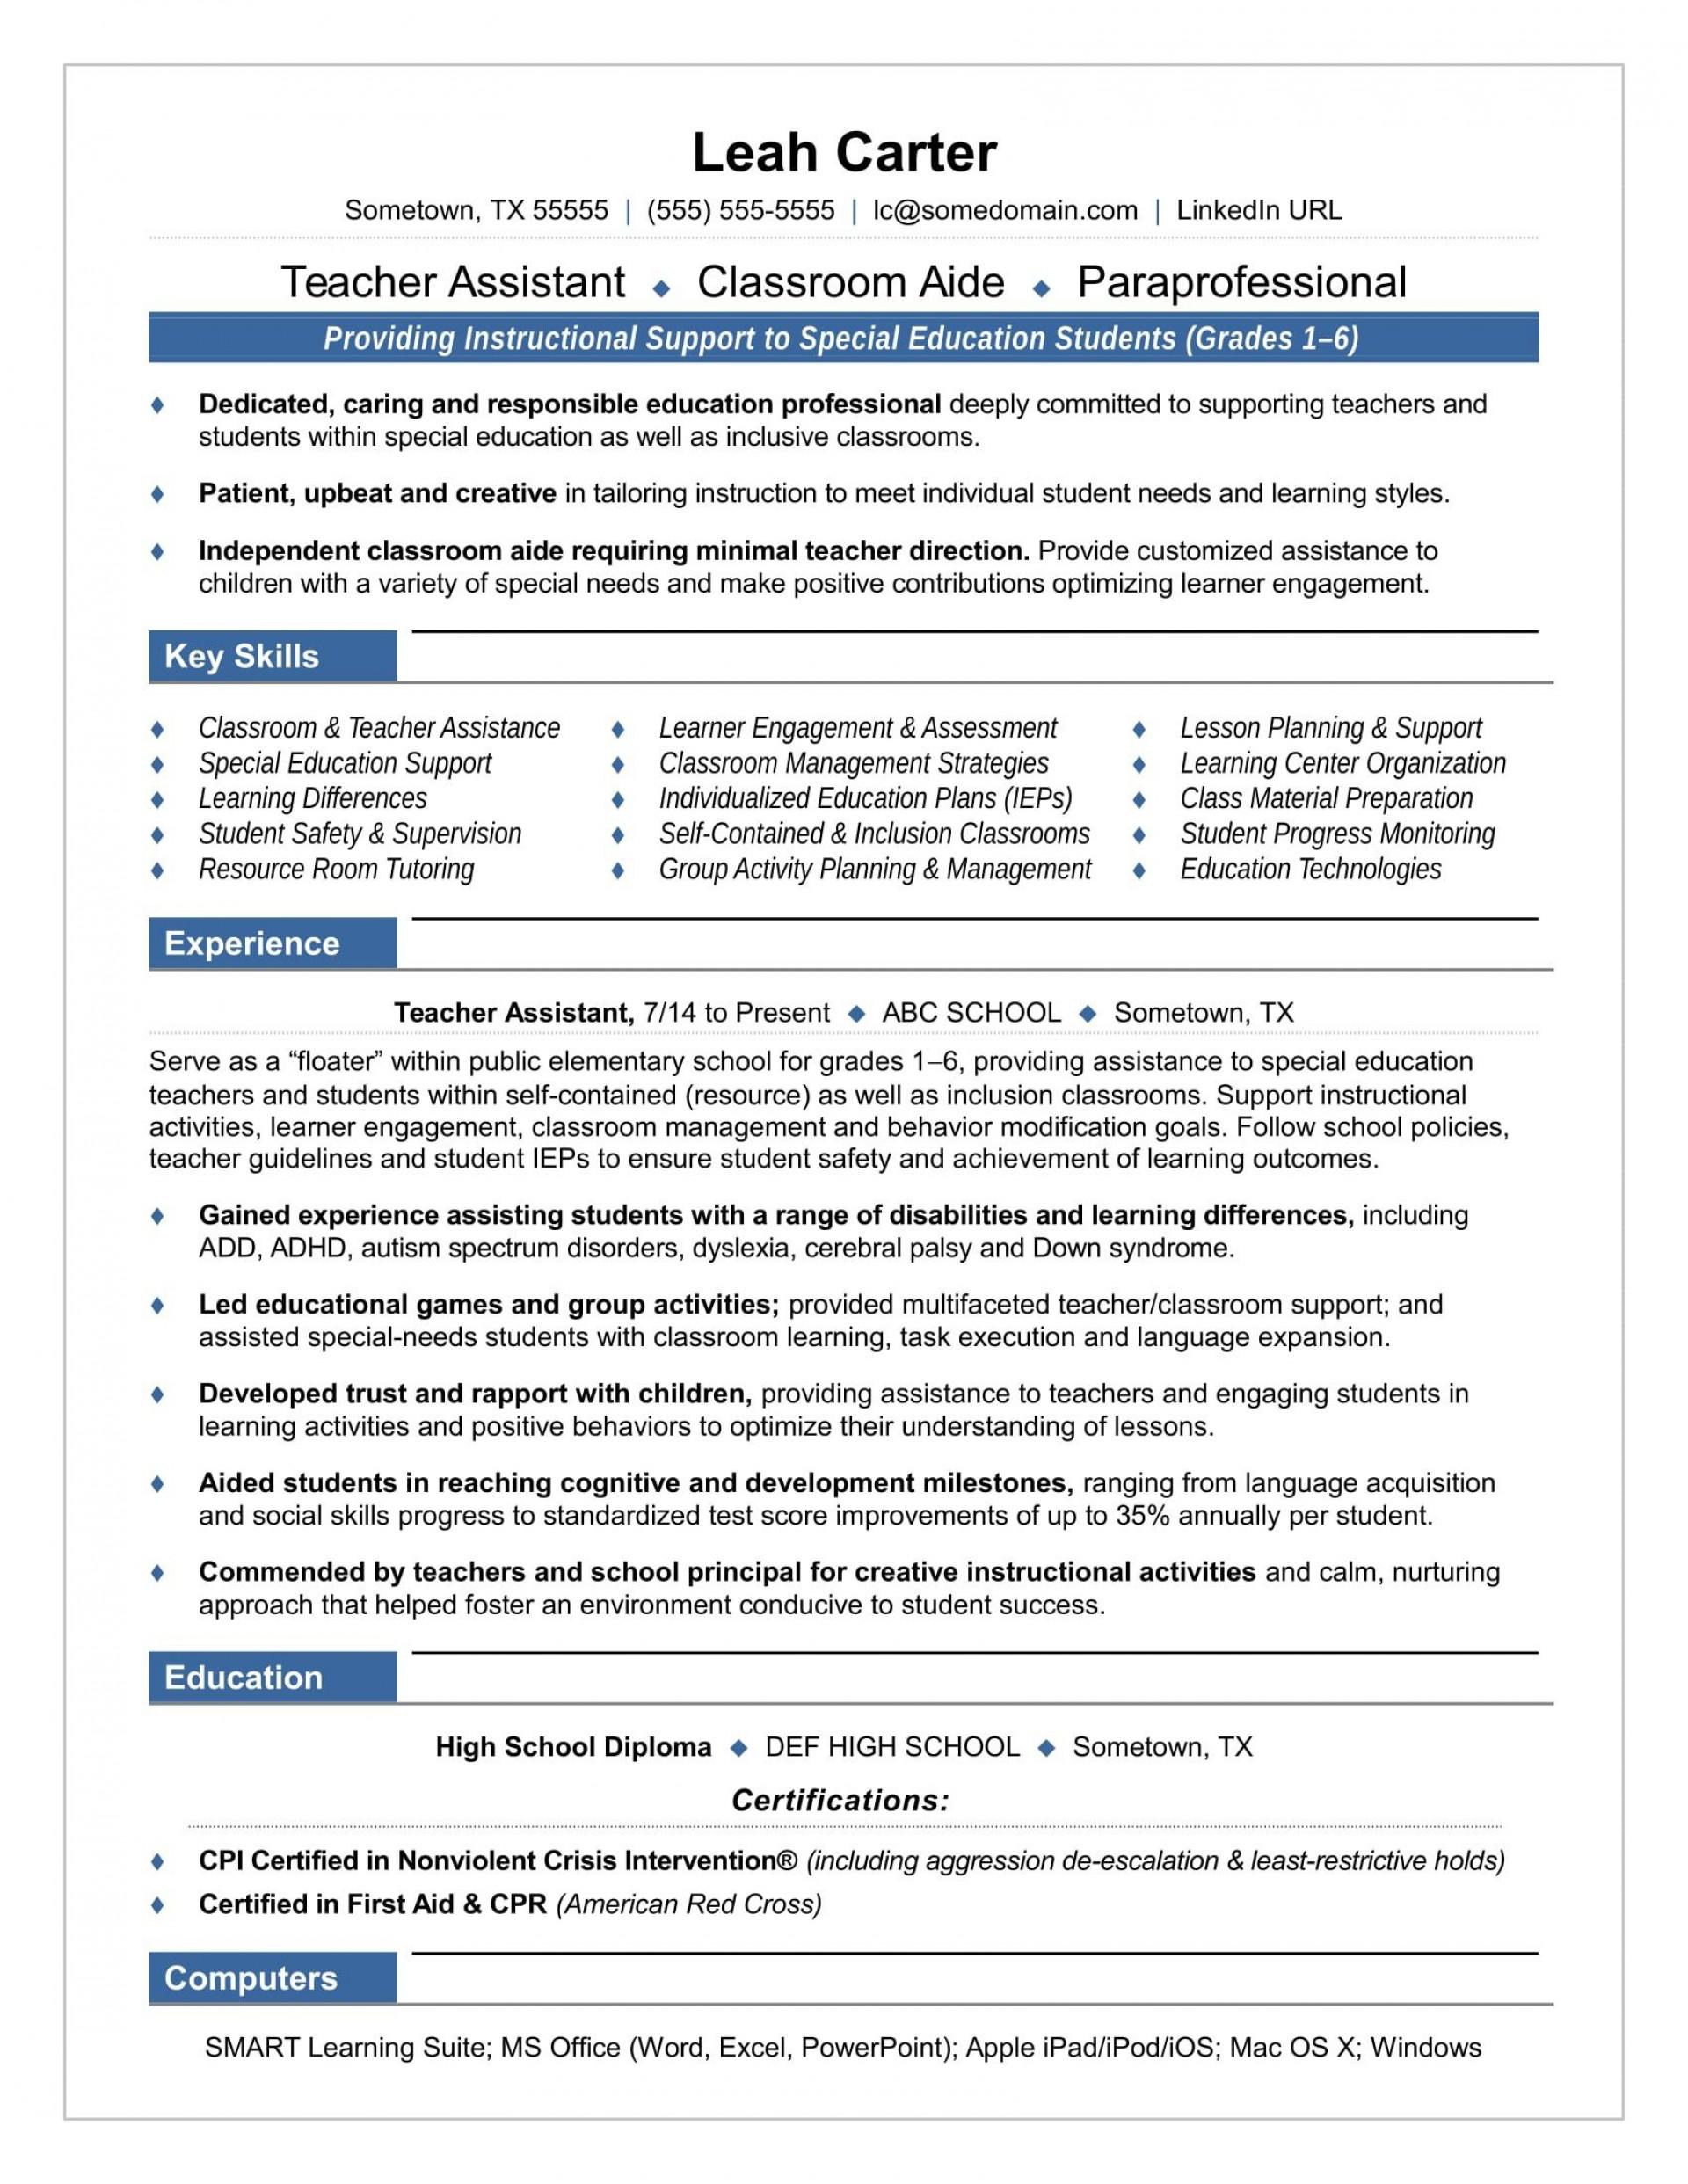 005 Sensational Resume Template For Teaching Job Highest Clarity  Sample Cv In India Format Example Teacher1920